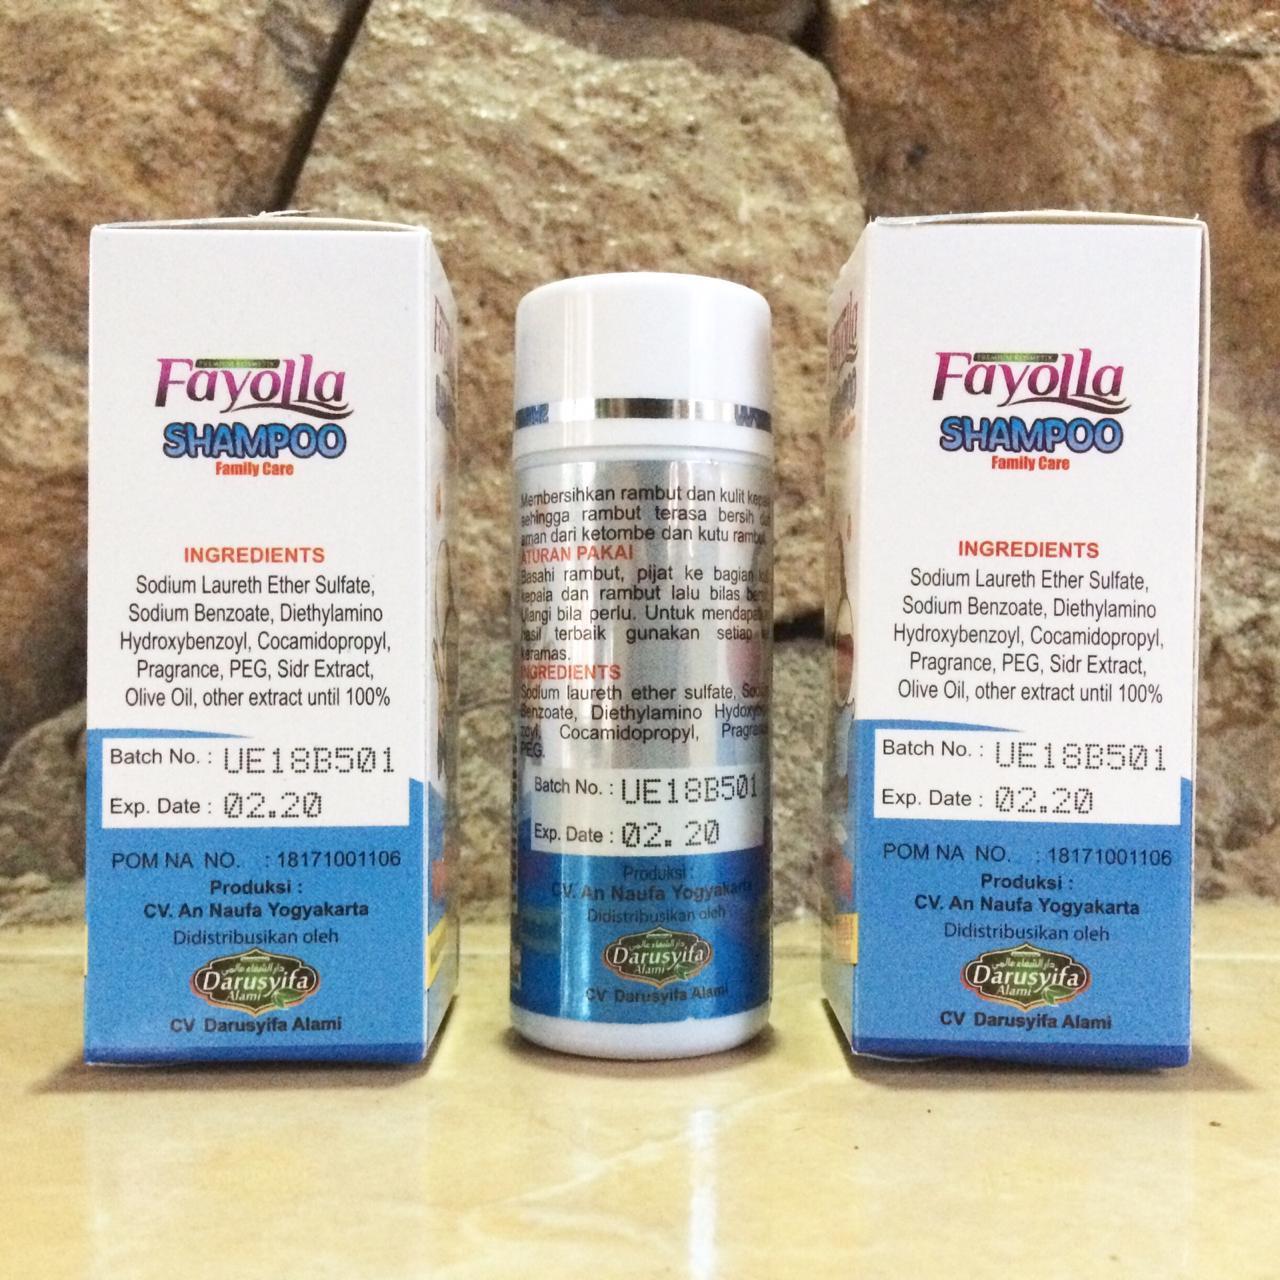 Fitur Shampo Shampoo Anti Lice Obat Membasmi Kutu Rambut Anak Nabila Sampo Original 4